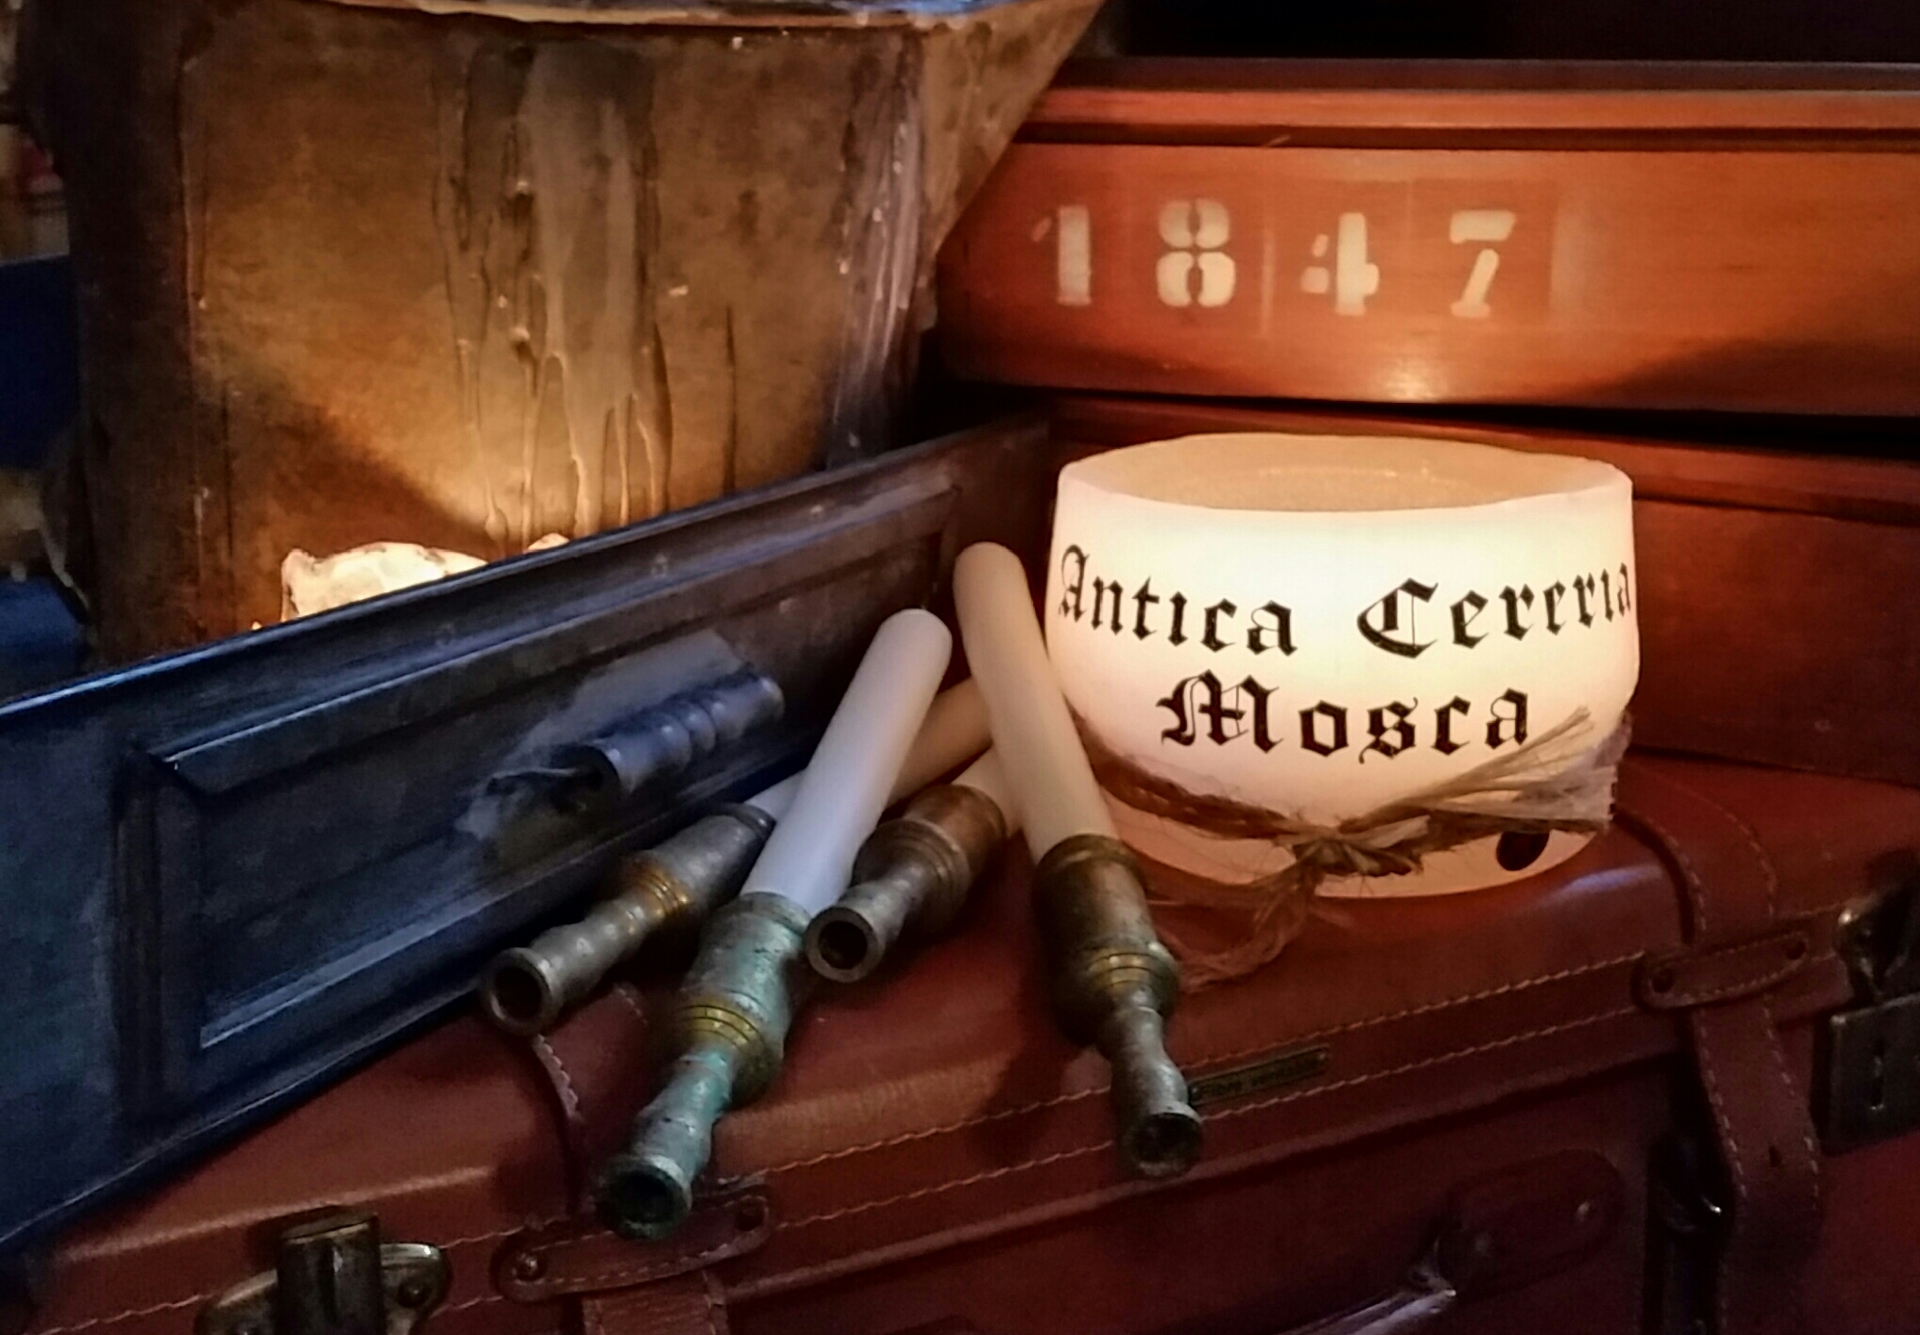 antica-cereria-mosca-wax-craftsmen-busto-arsizio-varese-thumbnail